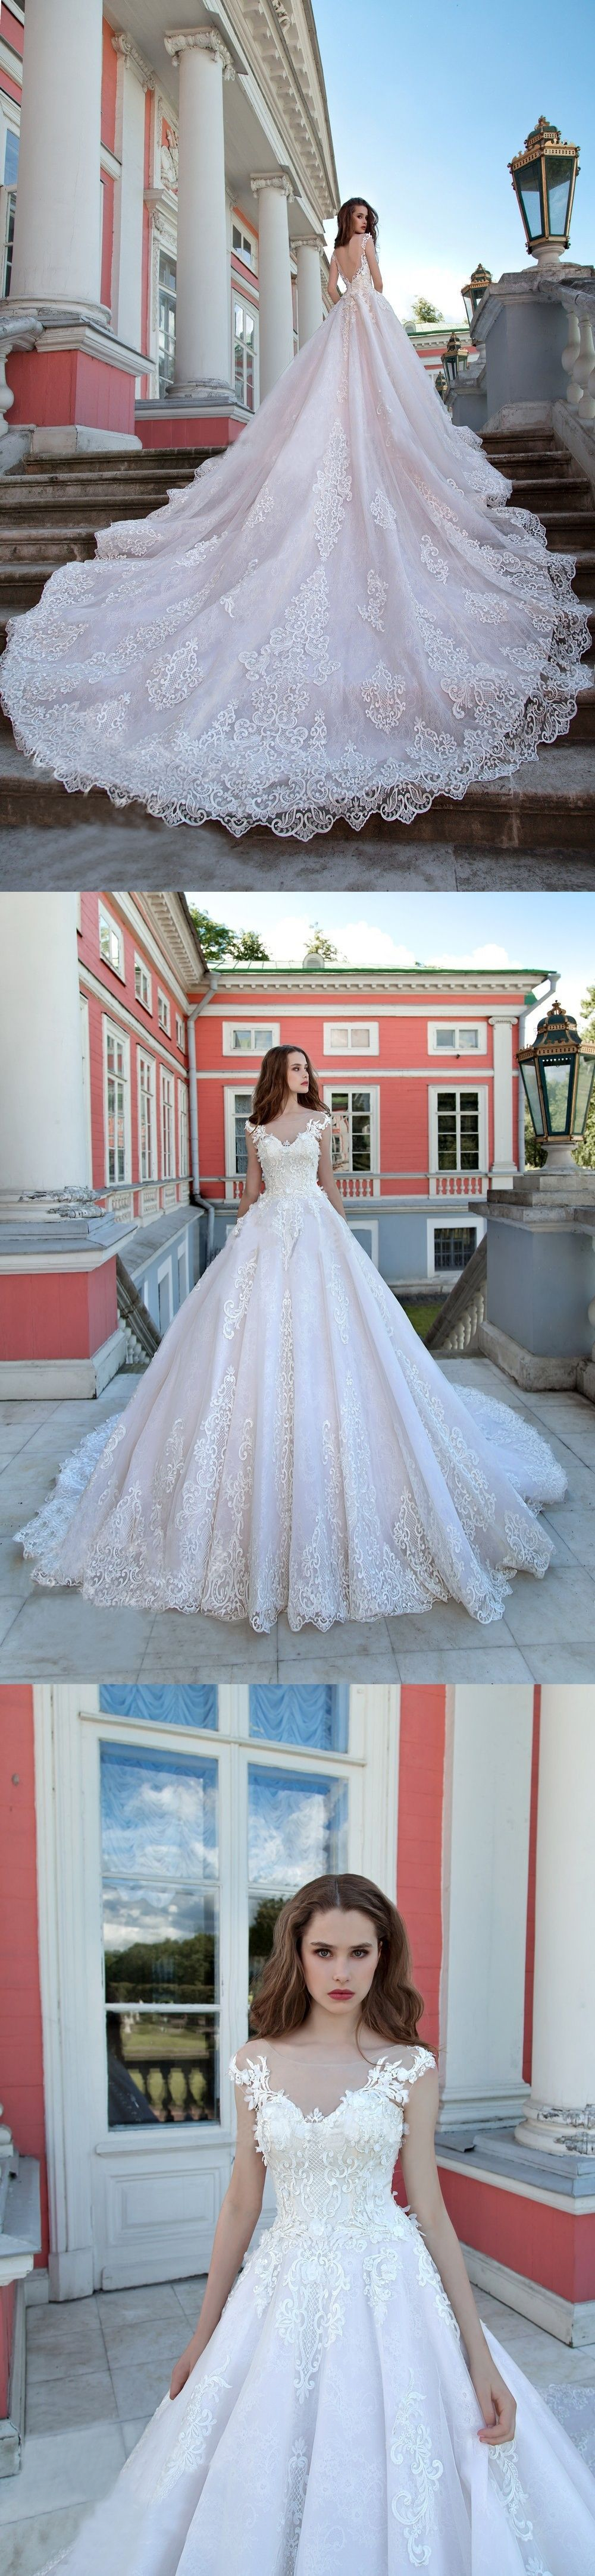 Wedding Dresses 2018 Beautiful Wedding Dresses Big Wedding Dresses Wedding Dresses Roma Backless Wedding Dress Wedding Dress Flowy Lace Ball Gown Wedding Dress